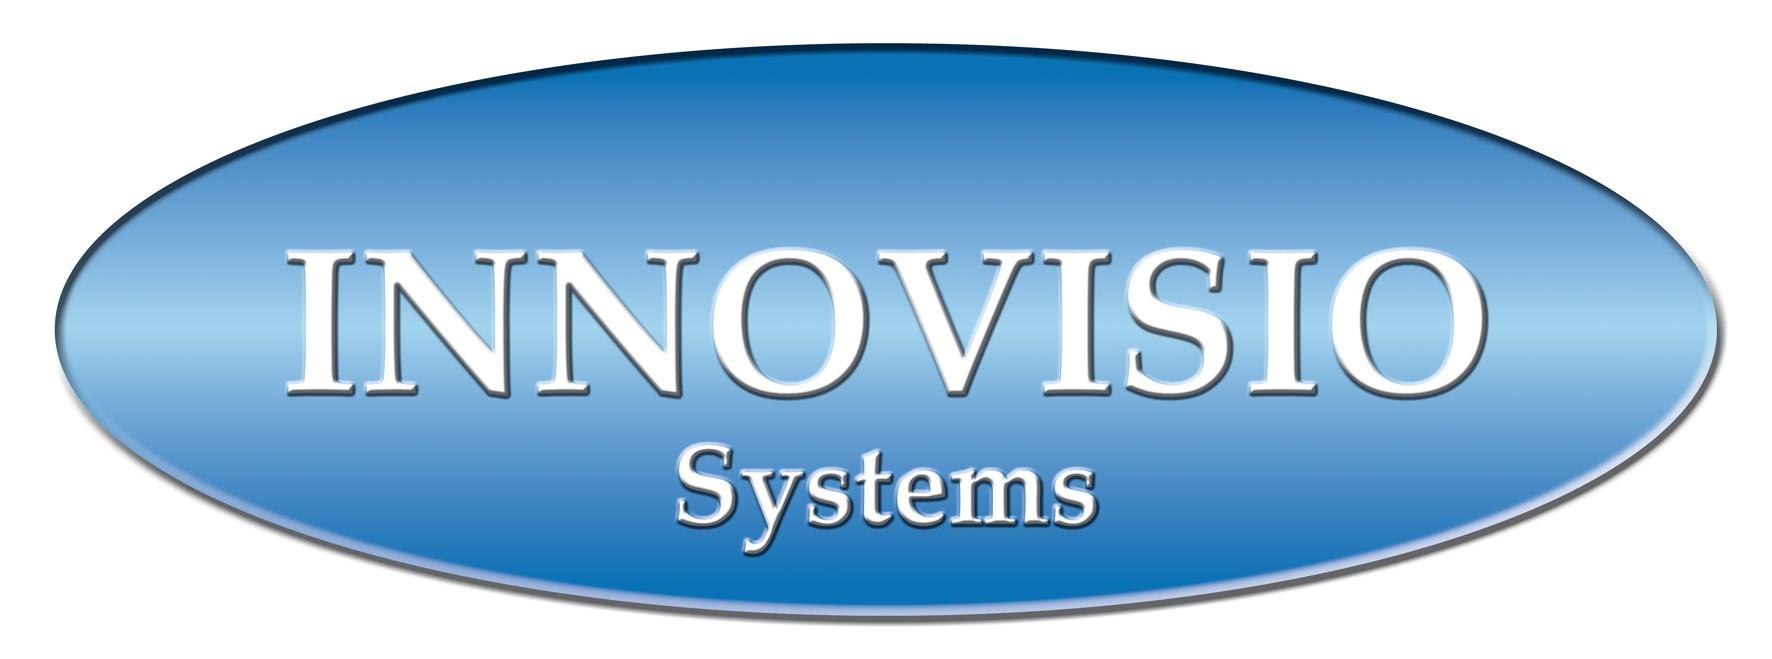 INNOVISIO Systems